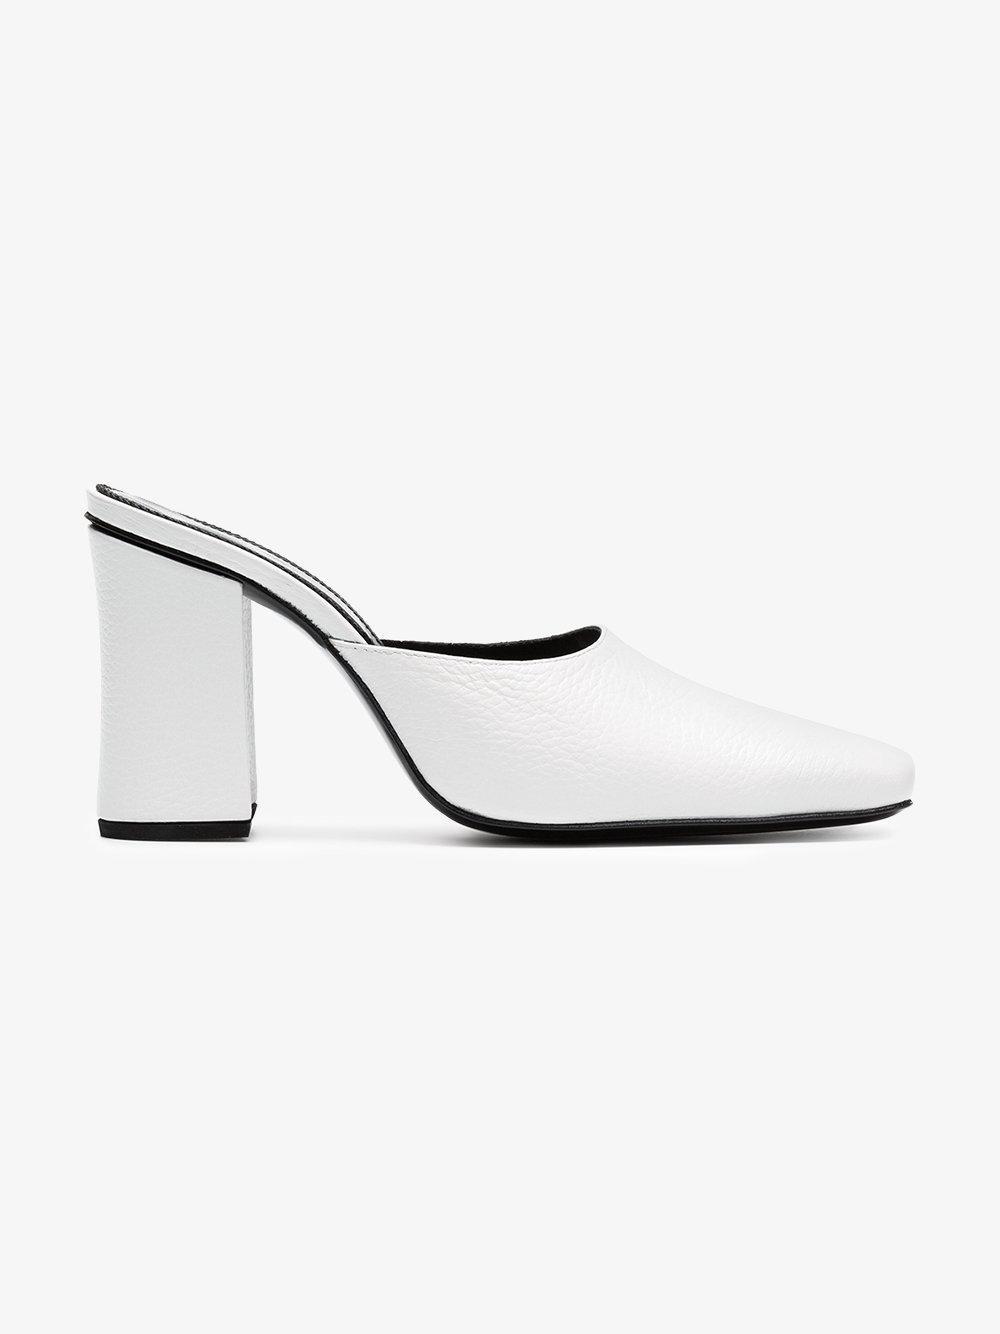 DORATEYMUR Mule 90 leather high heel pumps Cost Online QbPJE